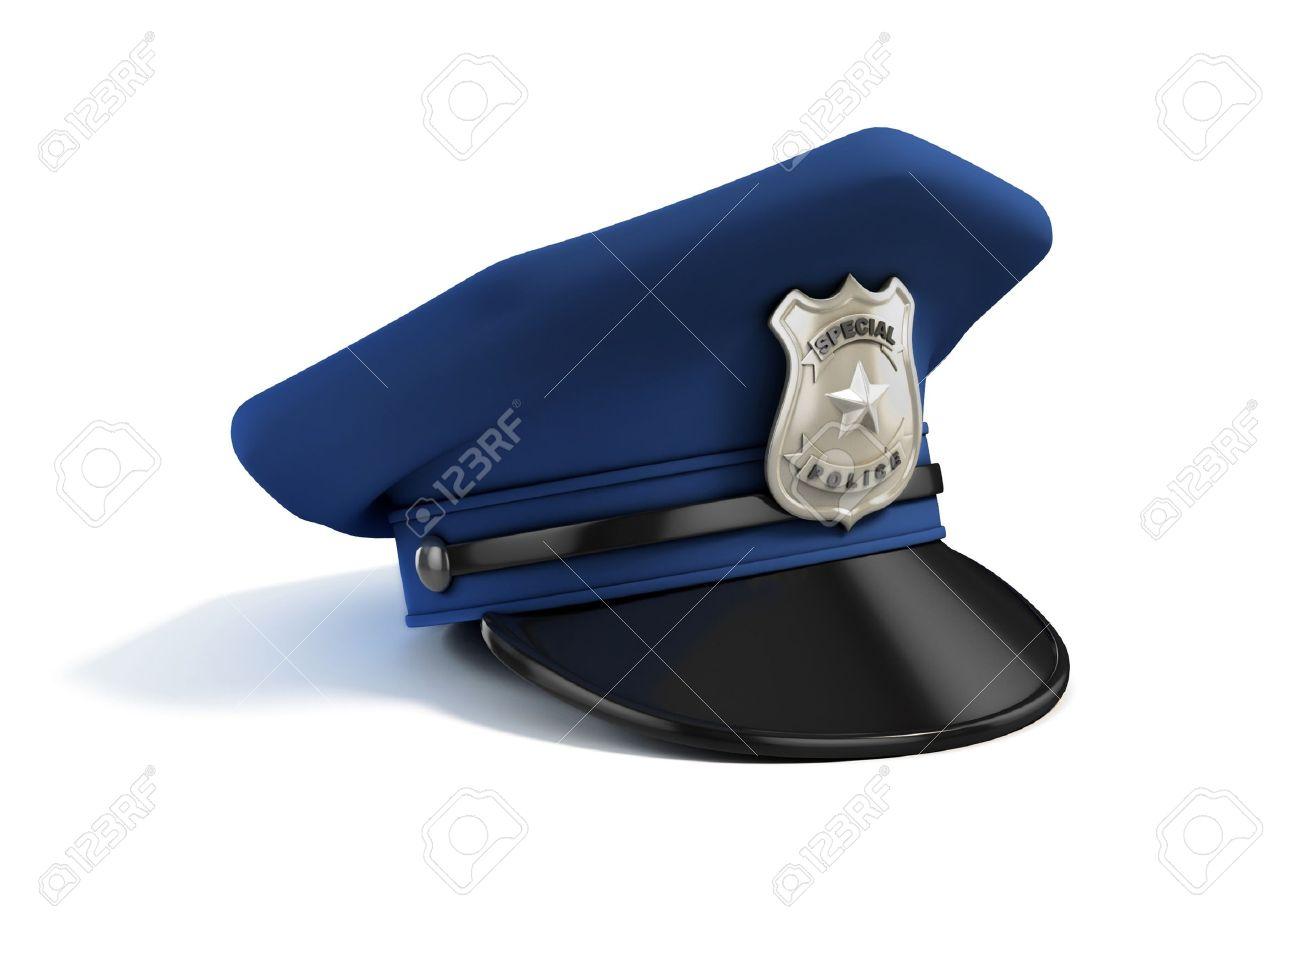 police hat 3d illustration Stock Photo - 12331308